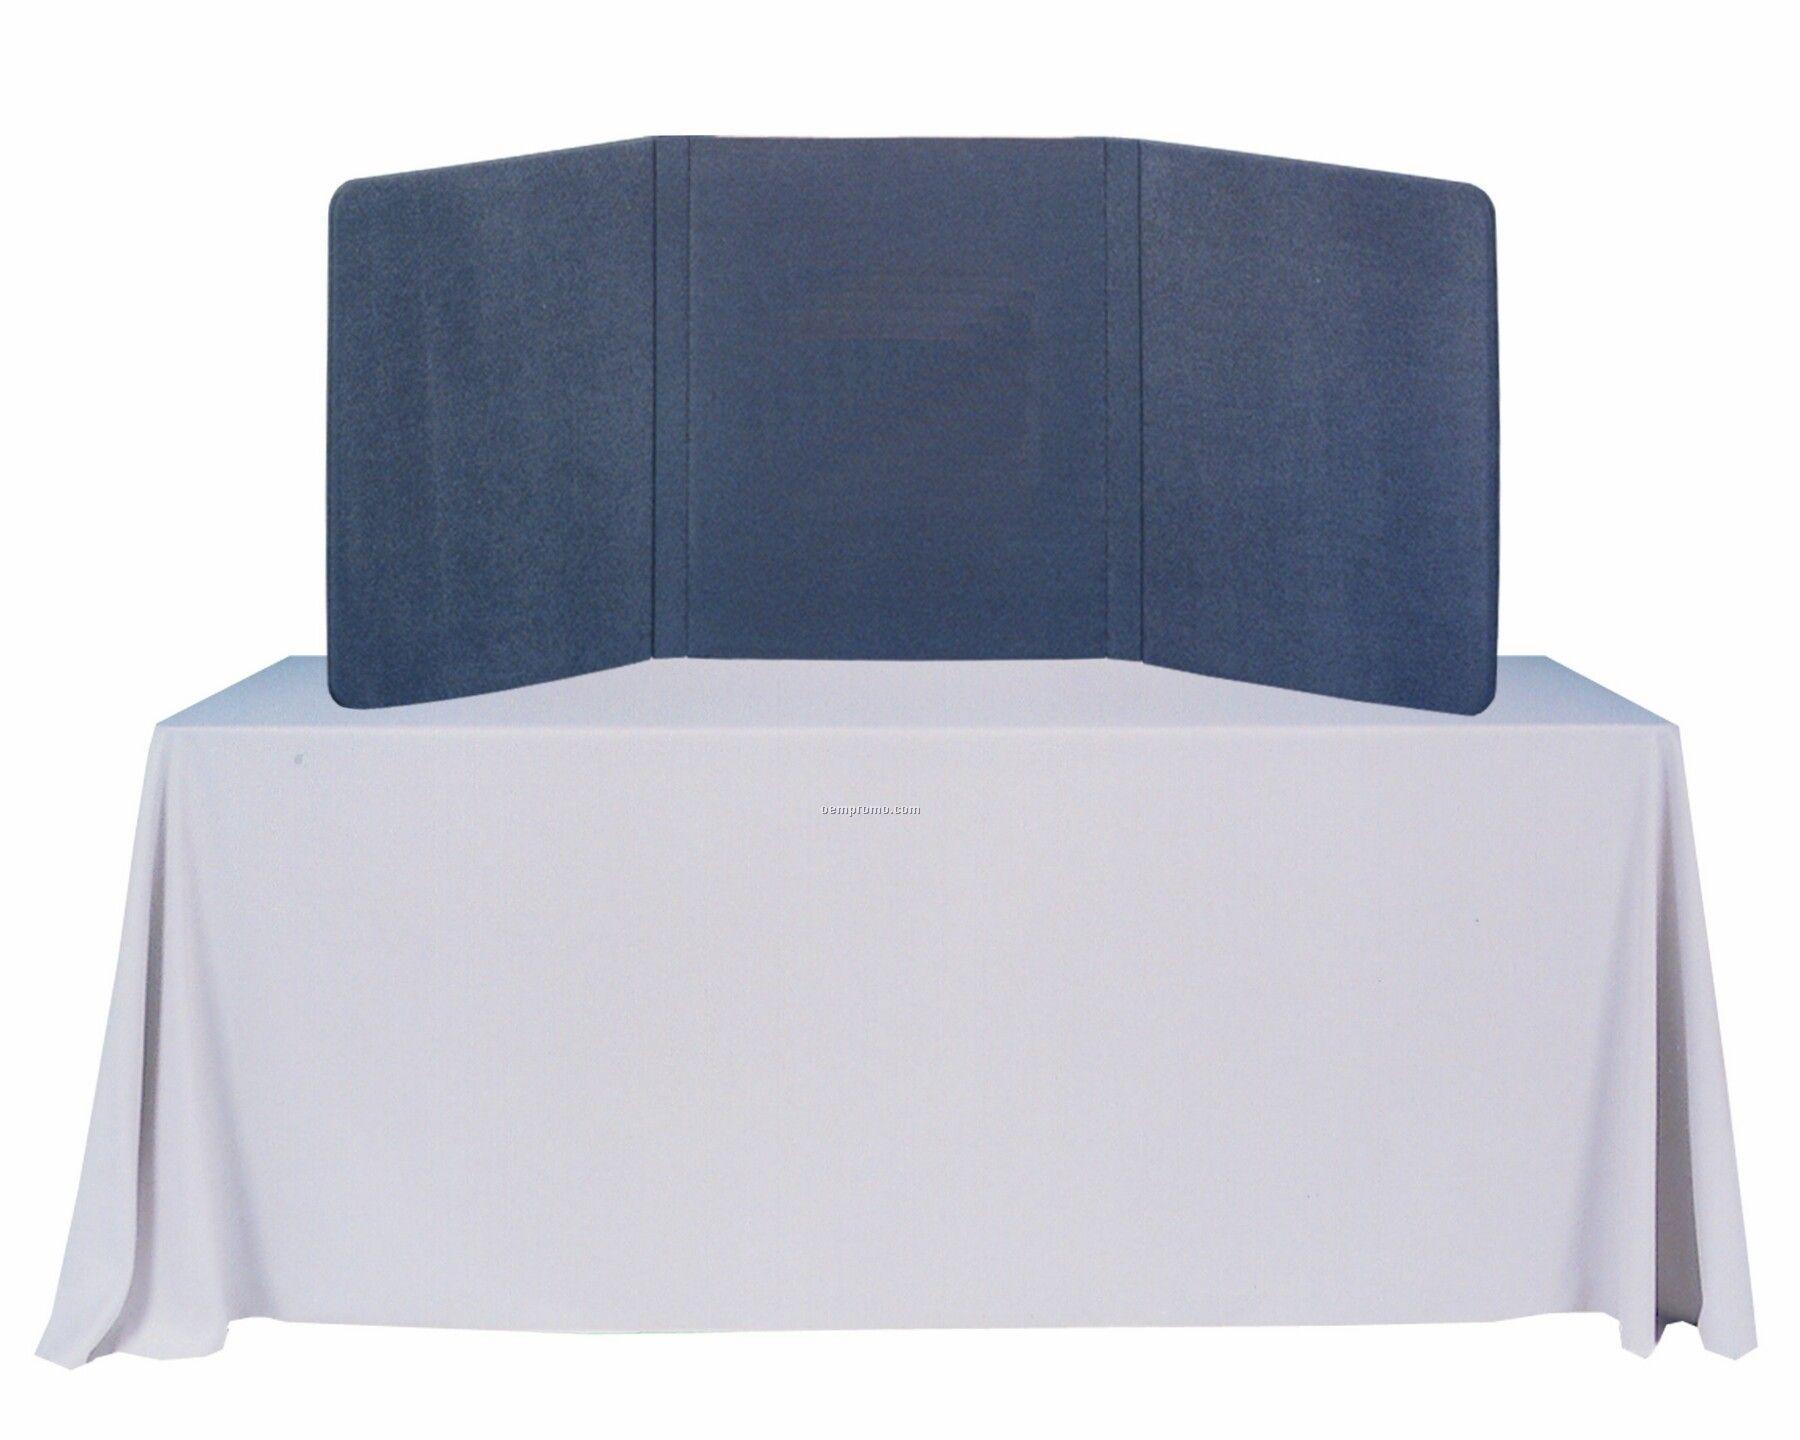 Radius Classic 3 Panel 28/35/3p Tabletop